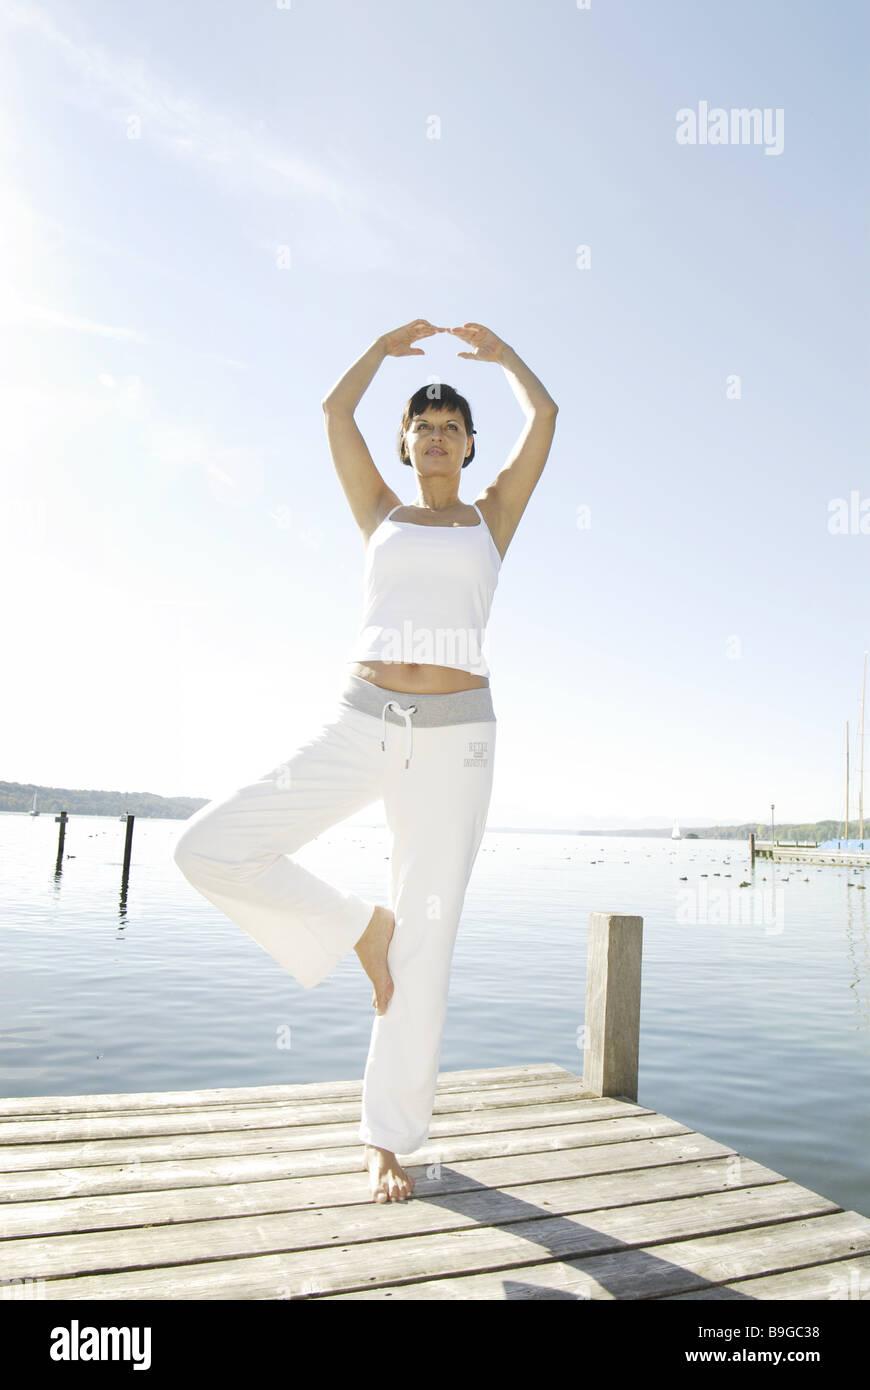 30-40 años solo balance fuera descalzo morena profundamente la respiración relajación recuperación Imagen De Stock